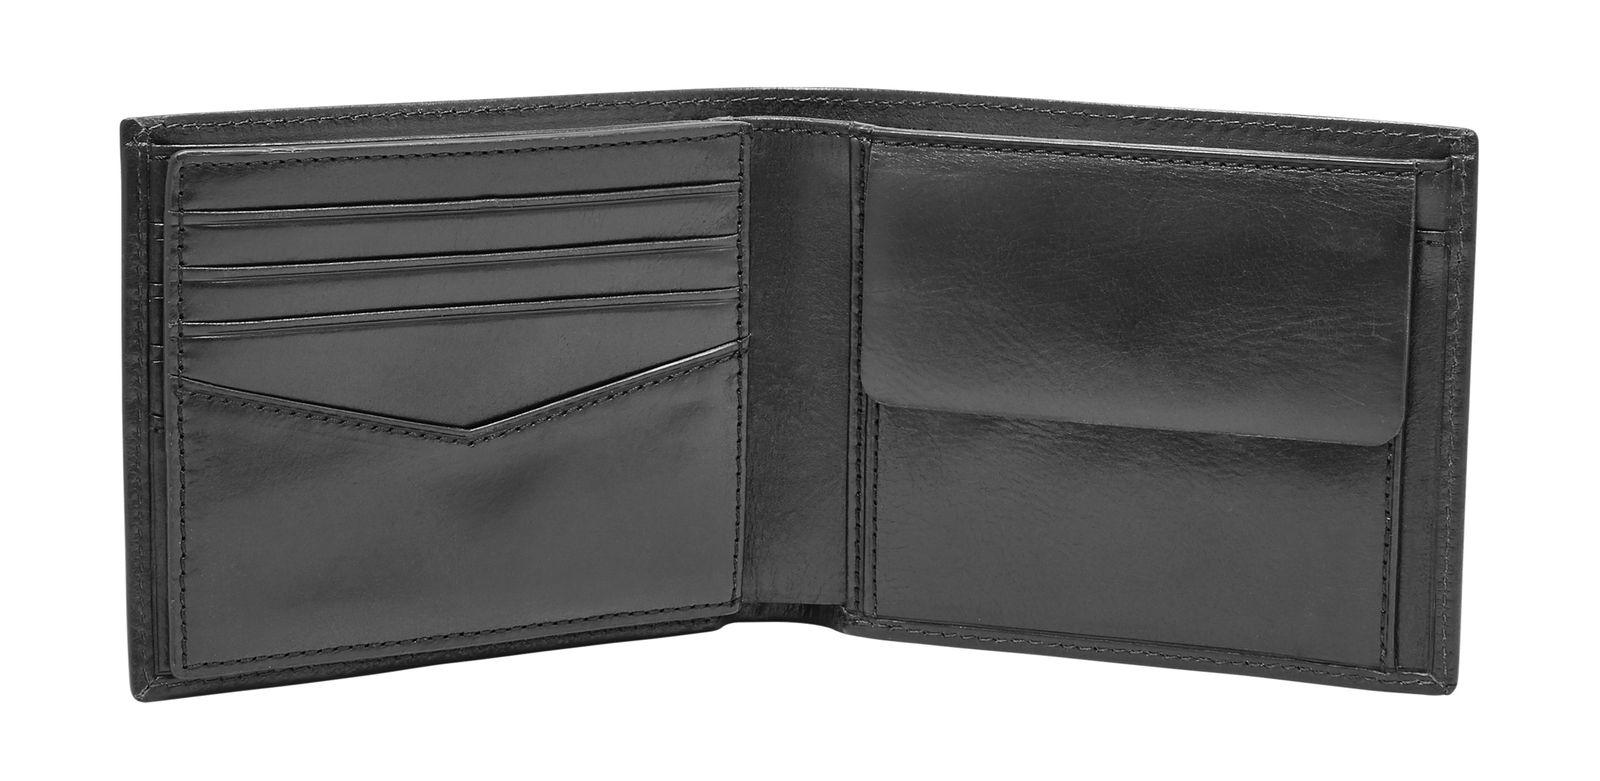 FOSSIL Ryan Large Coin Pocket Bifold Black